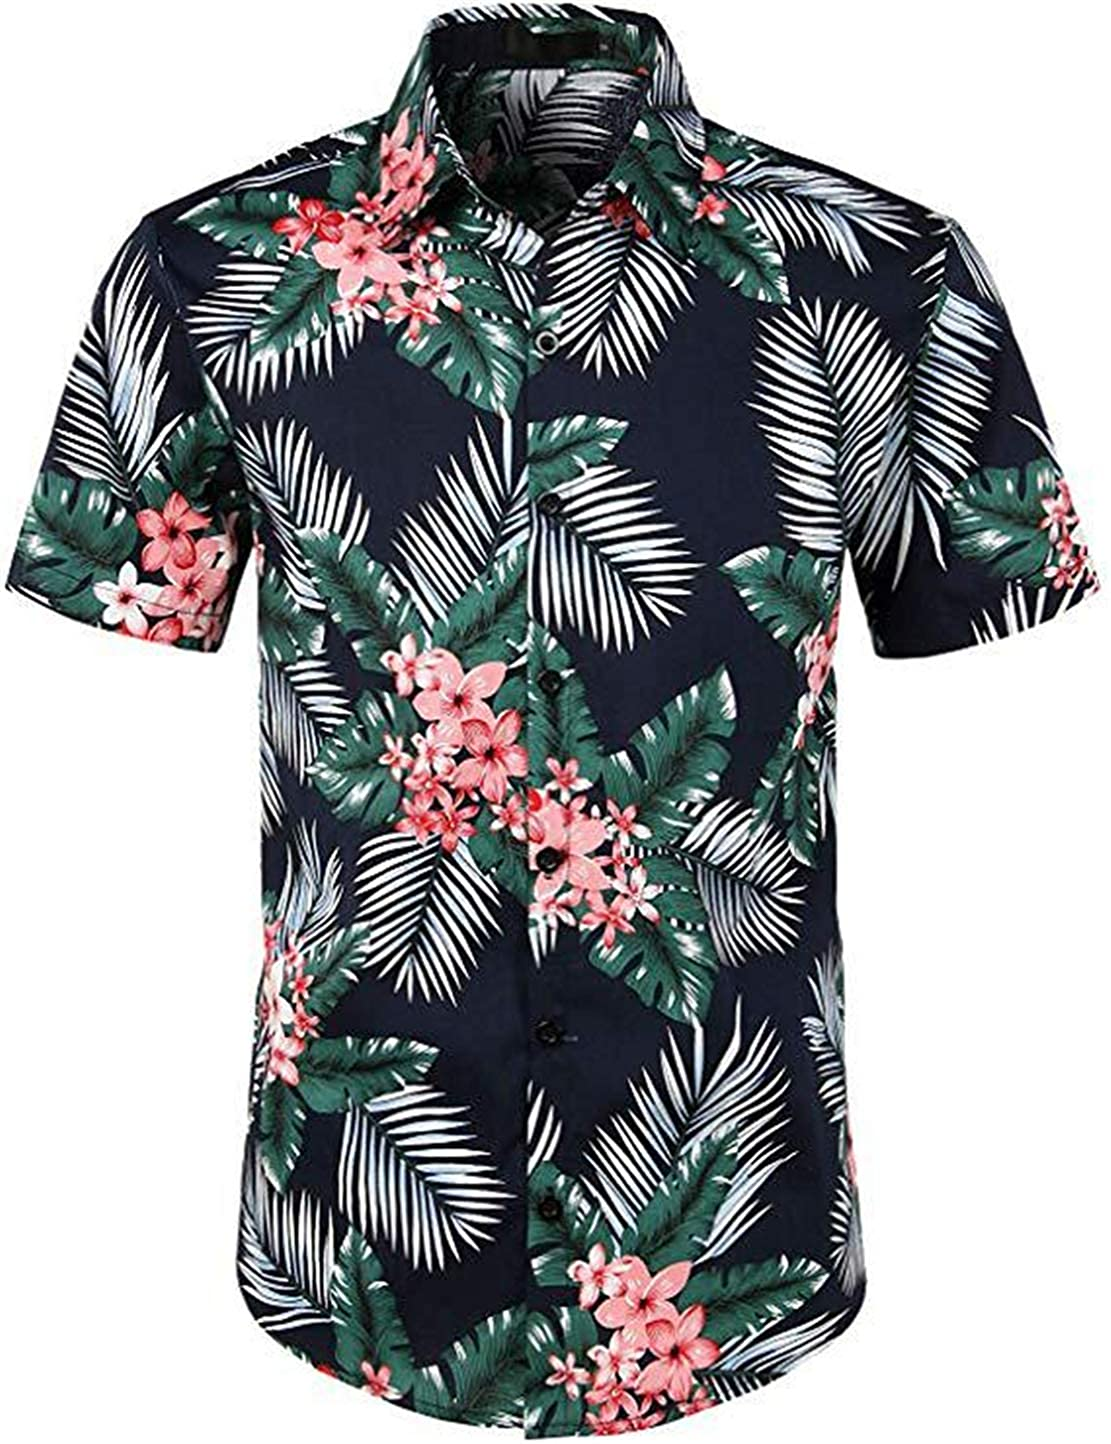 ZLL8 Slim-Fit Printed Cotton Tropical Hawaiian Casual Shirt Men